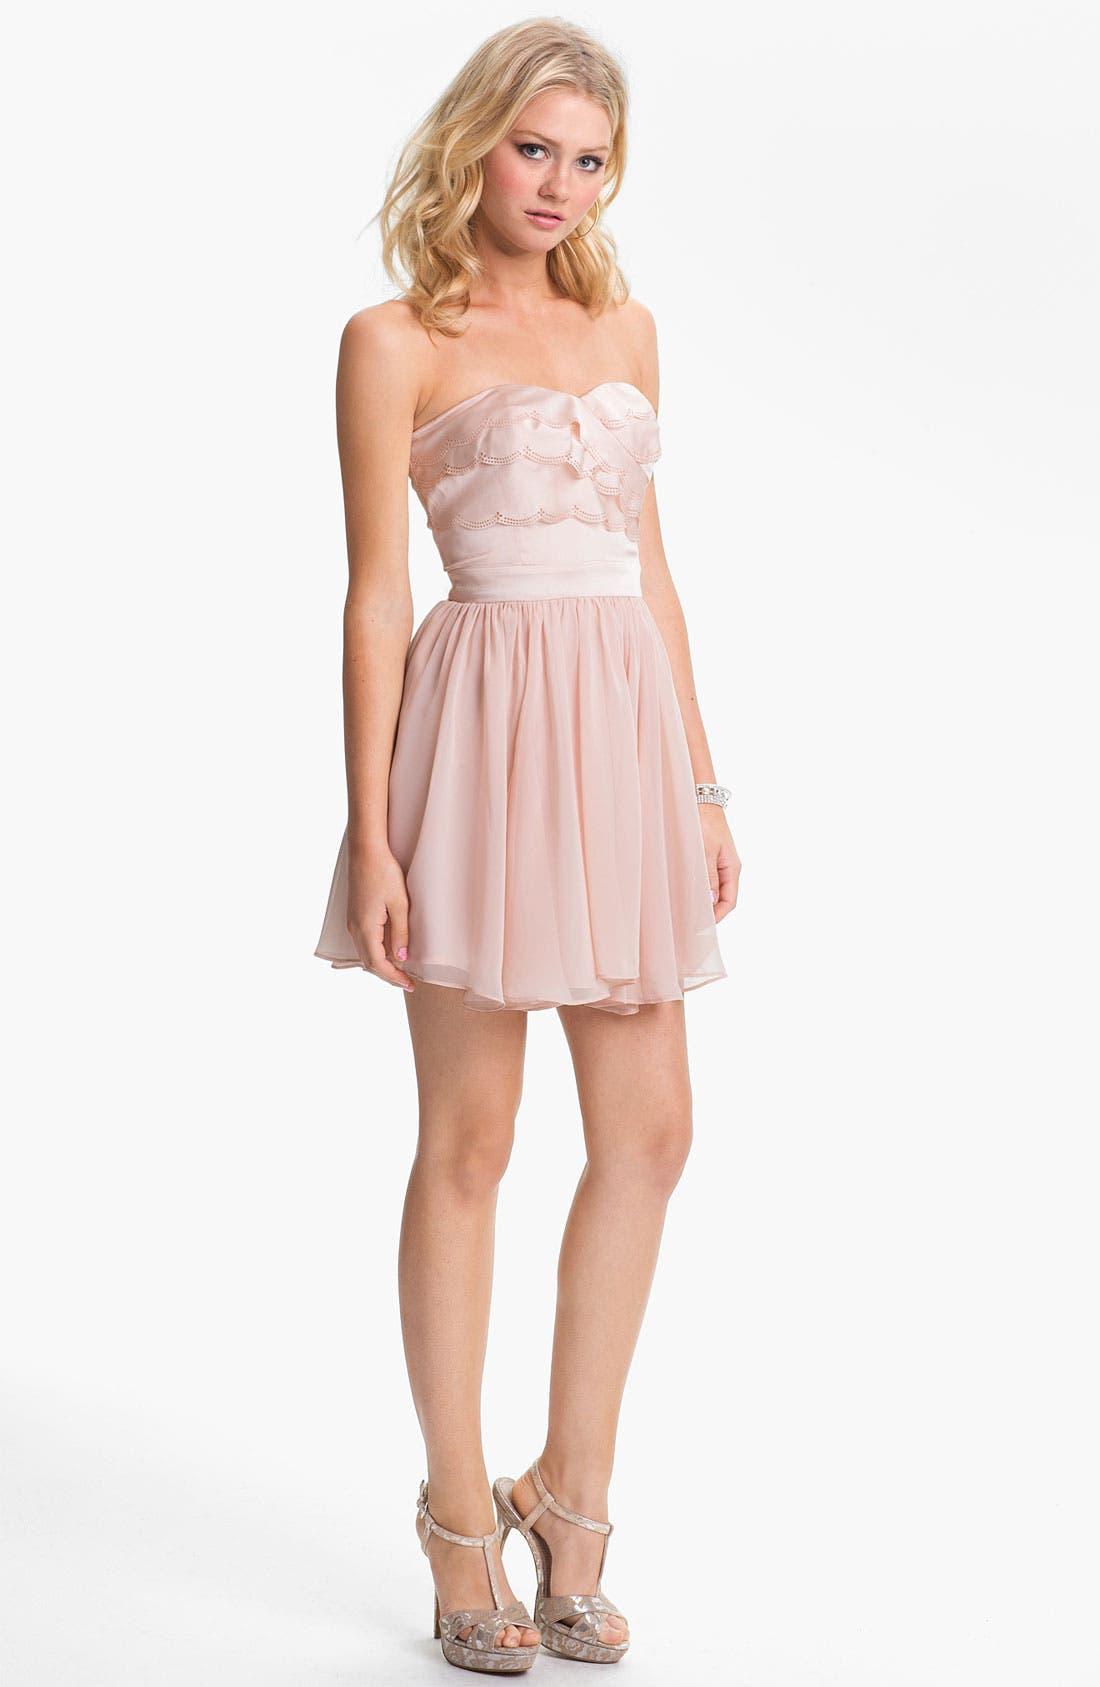 Alternate Image 1 Selected - En Crème Strapless Scalloped Chiffon Dress (Juniors)